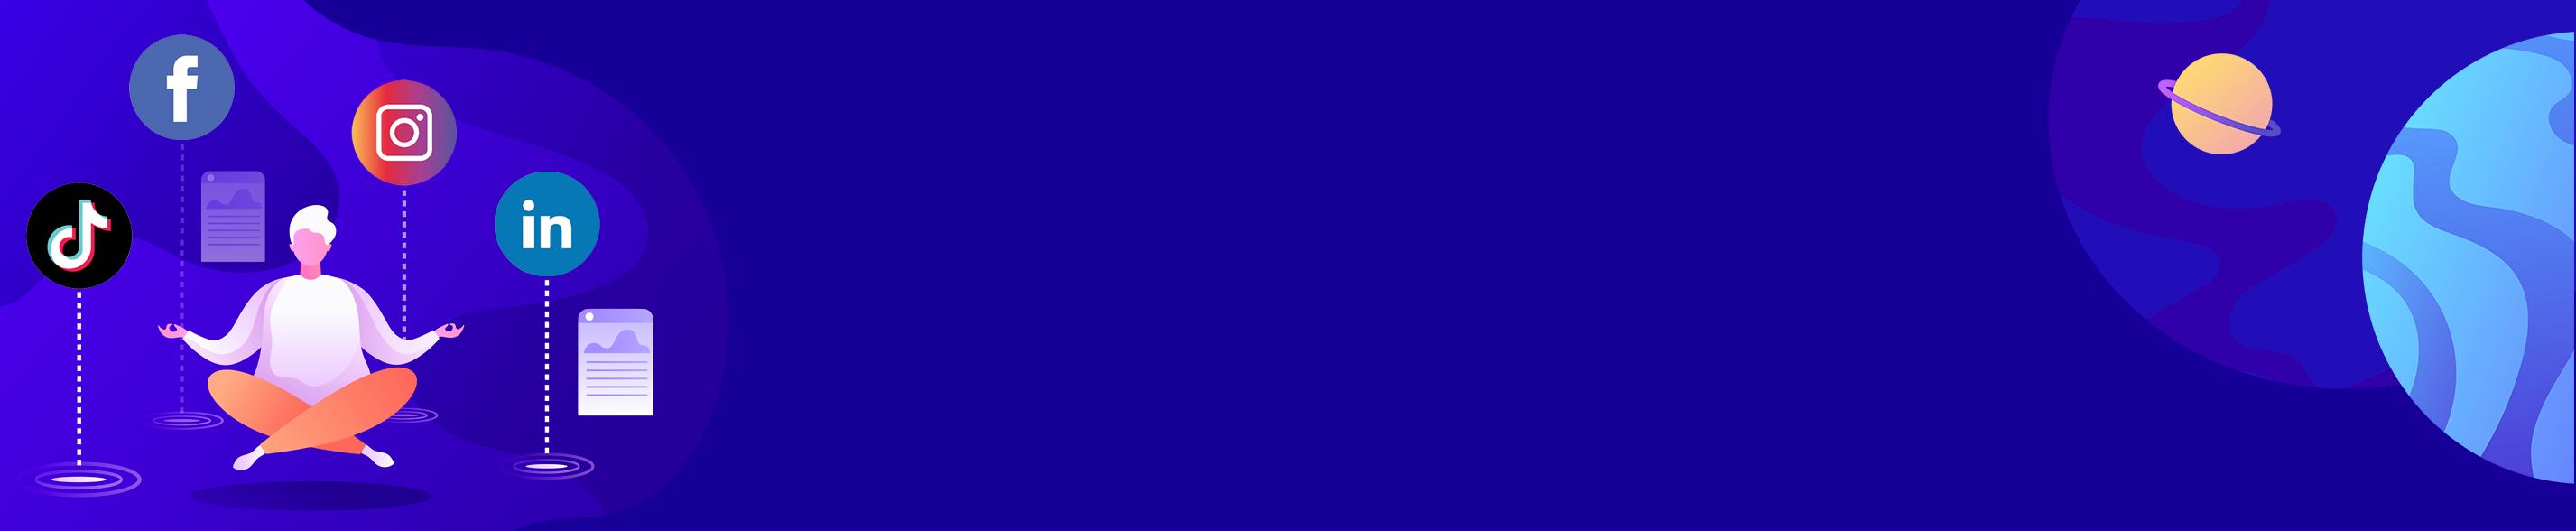 baner-sm